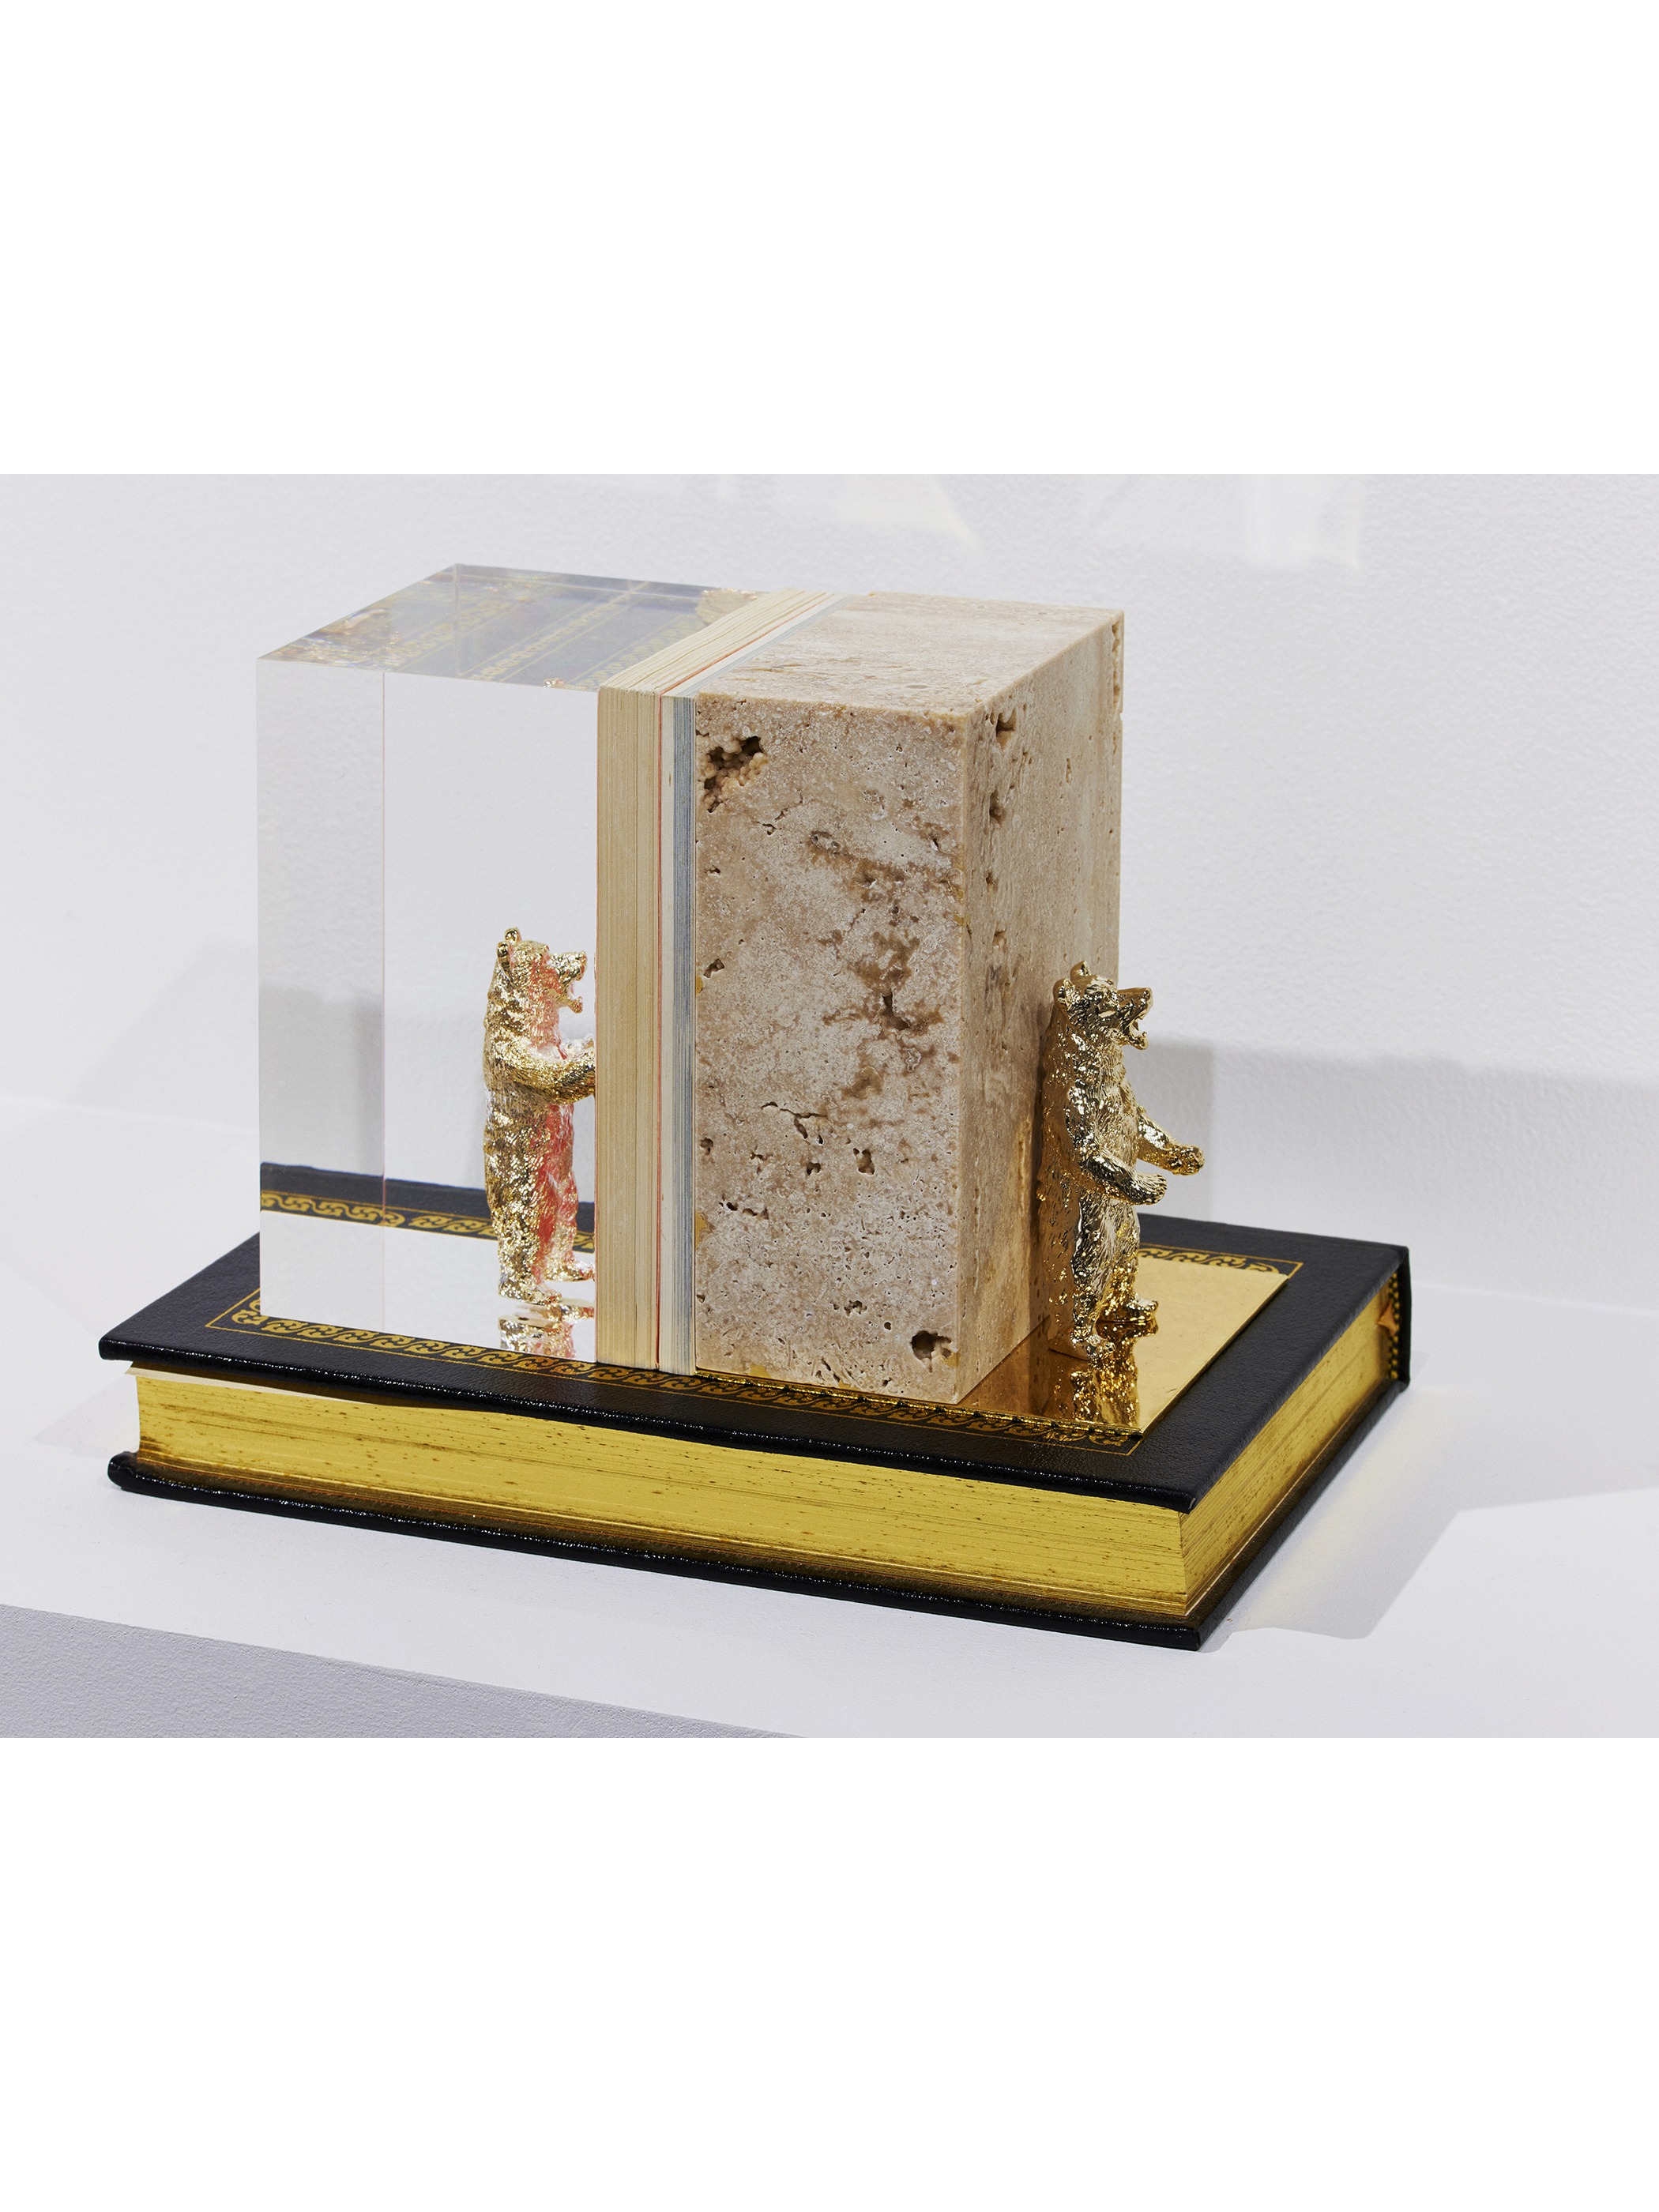 2018 exhibition ''moraltone'' marble bookend S【red travertine】